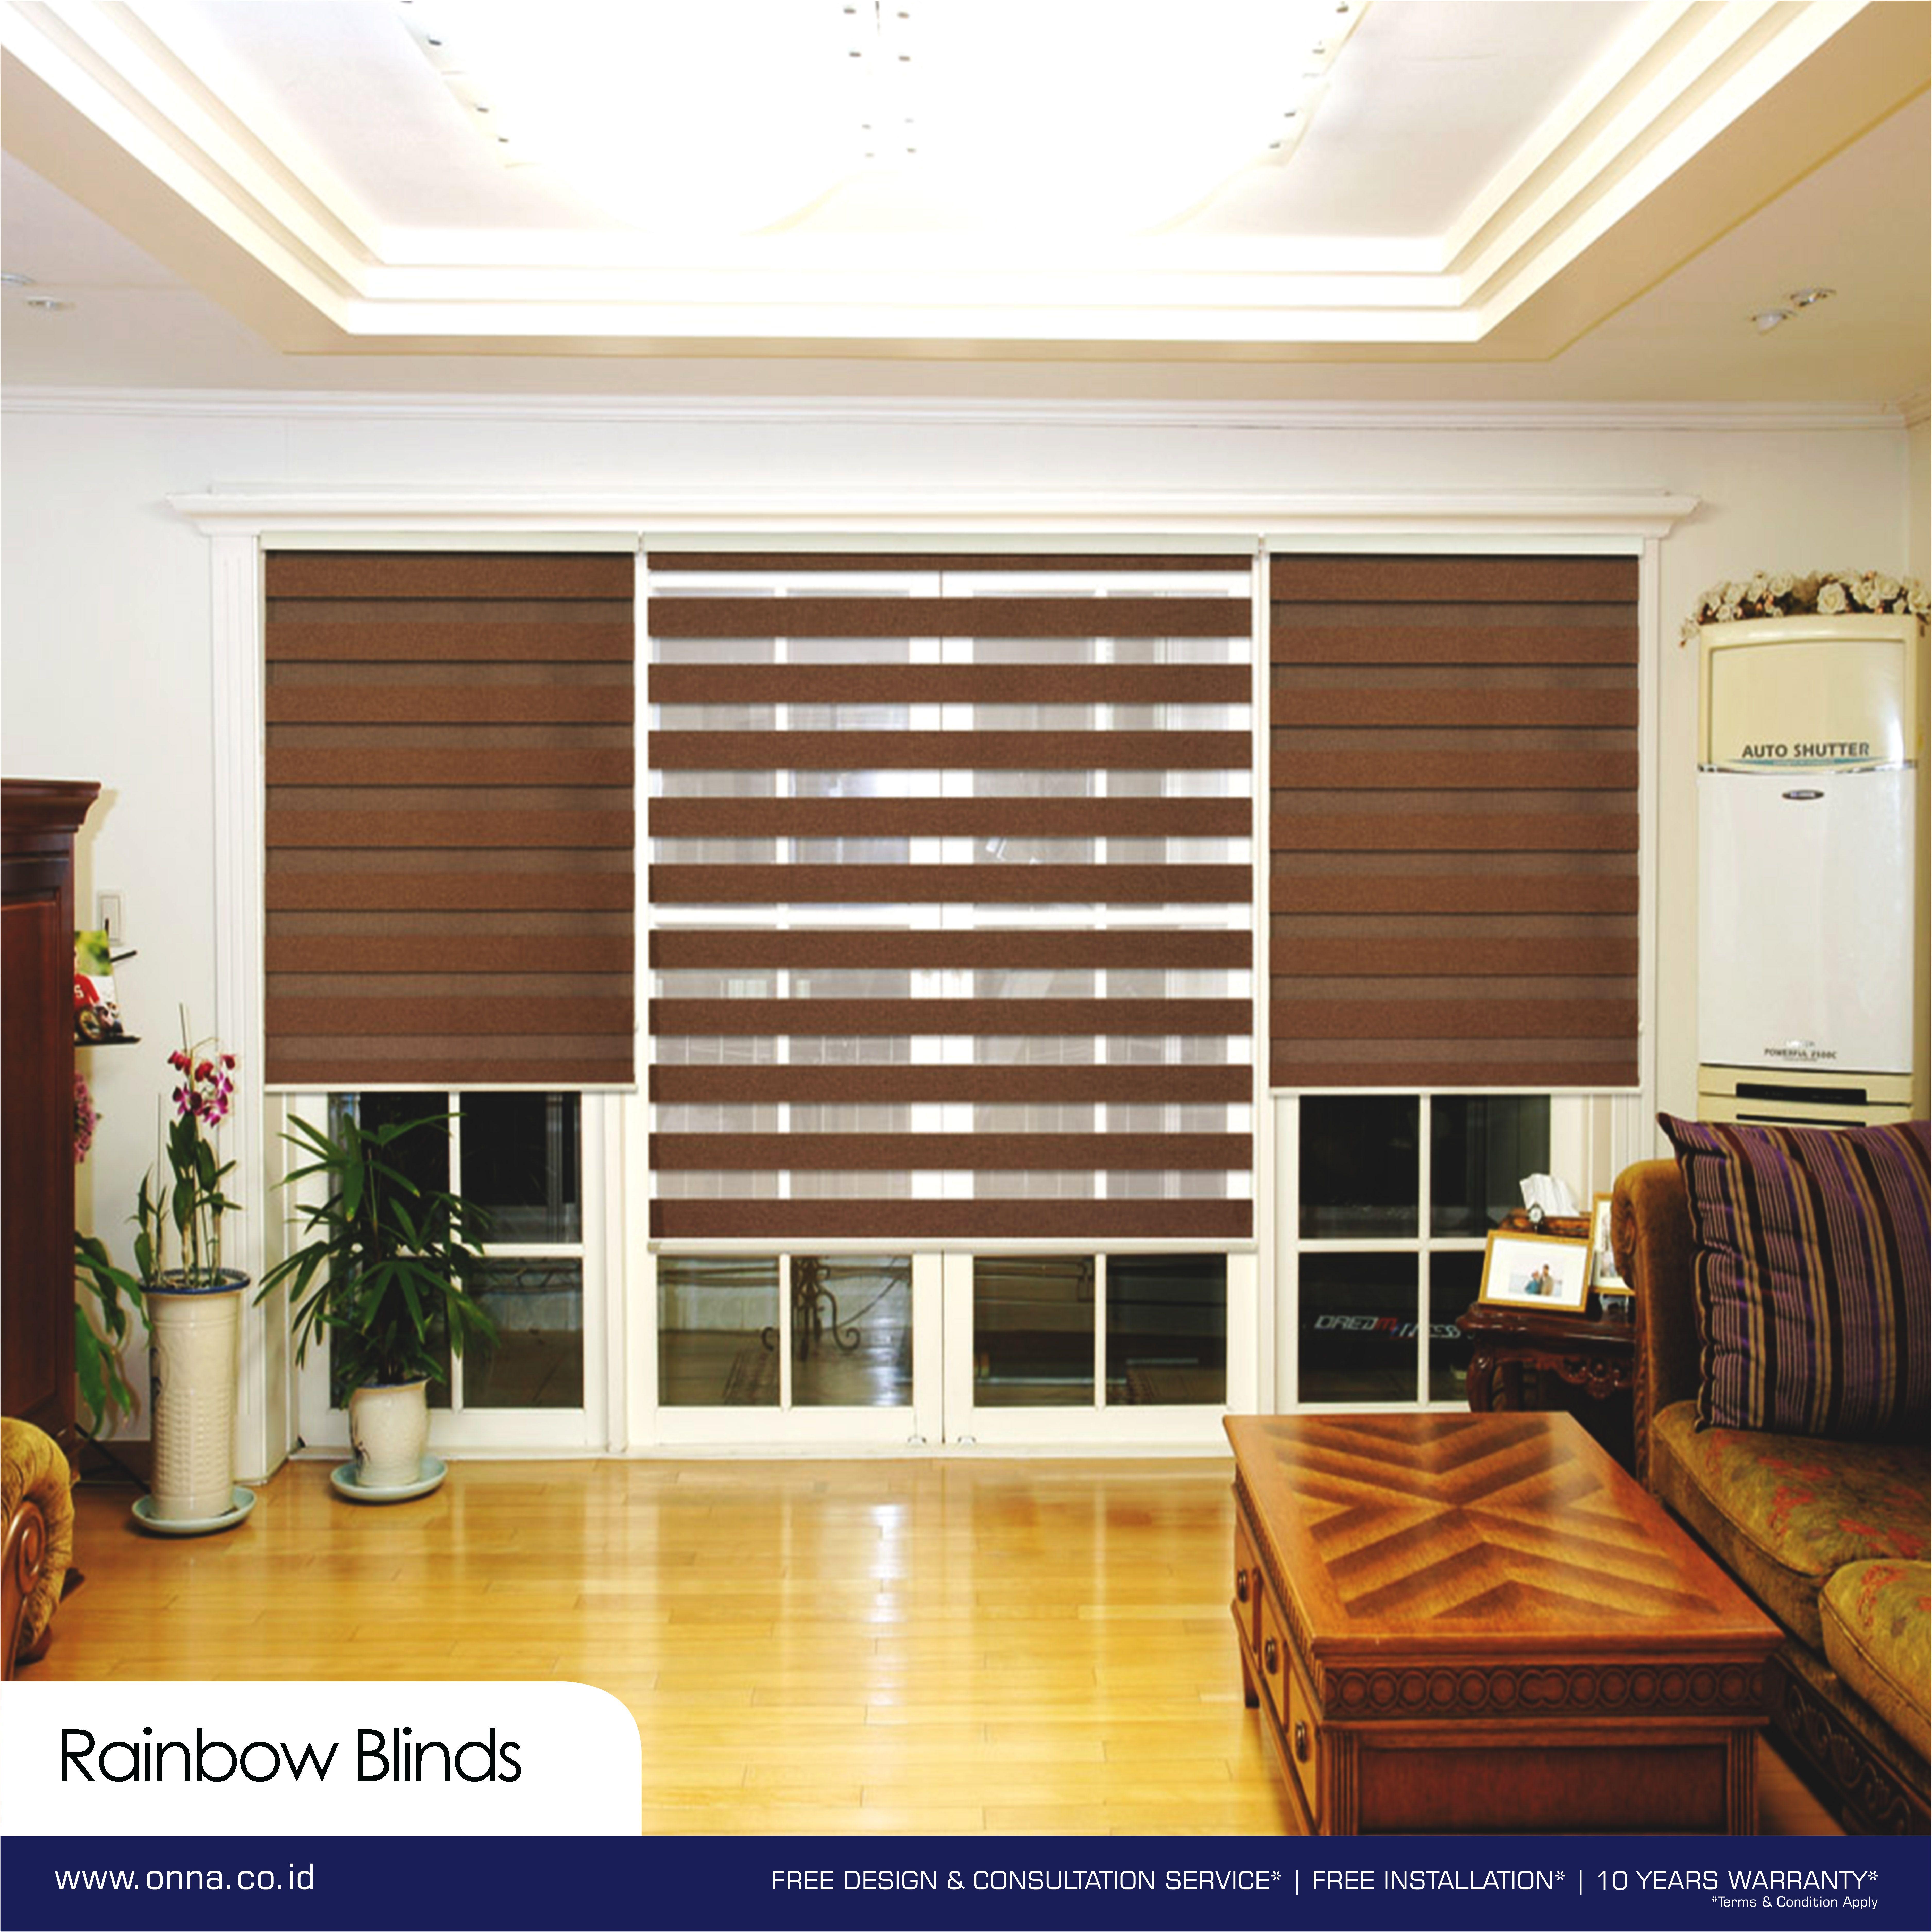 Keunggulan Dari Rainbow Blinds Adalah Dalam Segi Privacy Warna Gelap Dan Terang Pada Rainbow Blinds Memungkinkan Orang Yang Berada Di Blinds House Home Decor